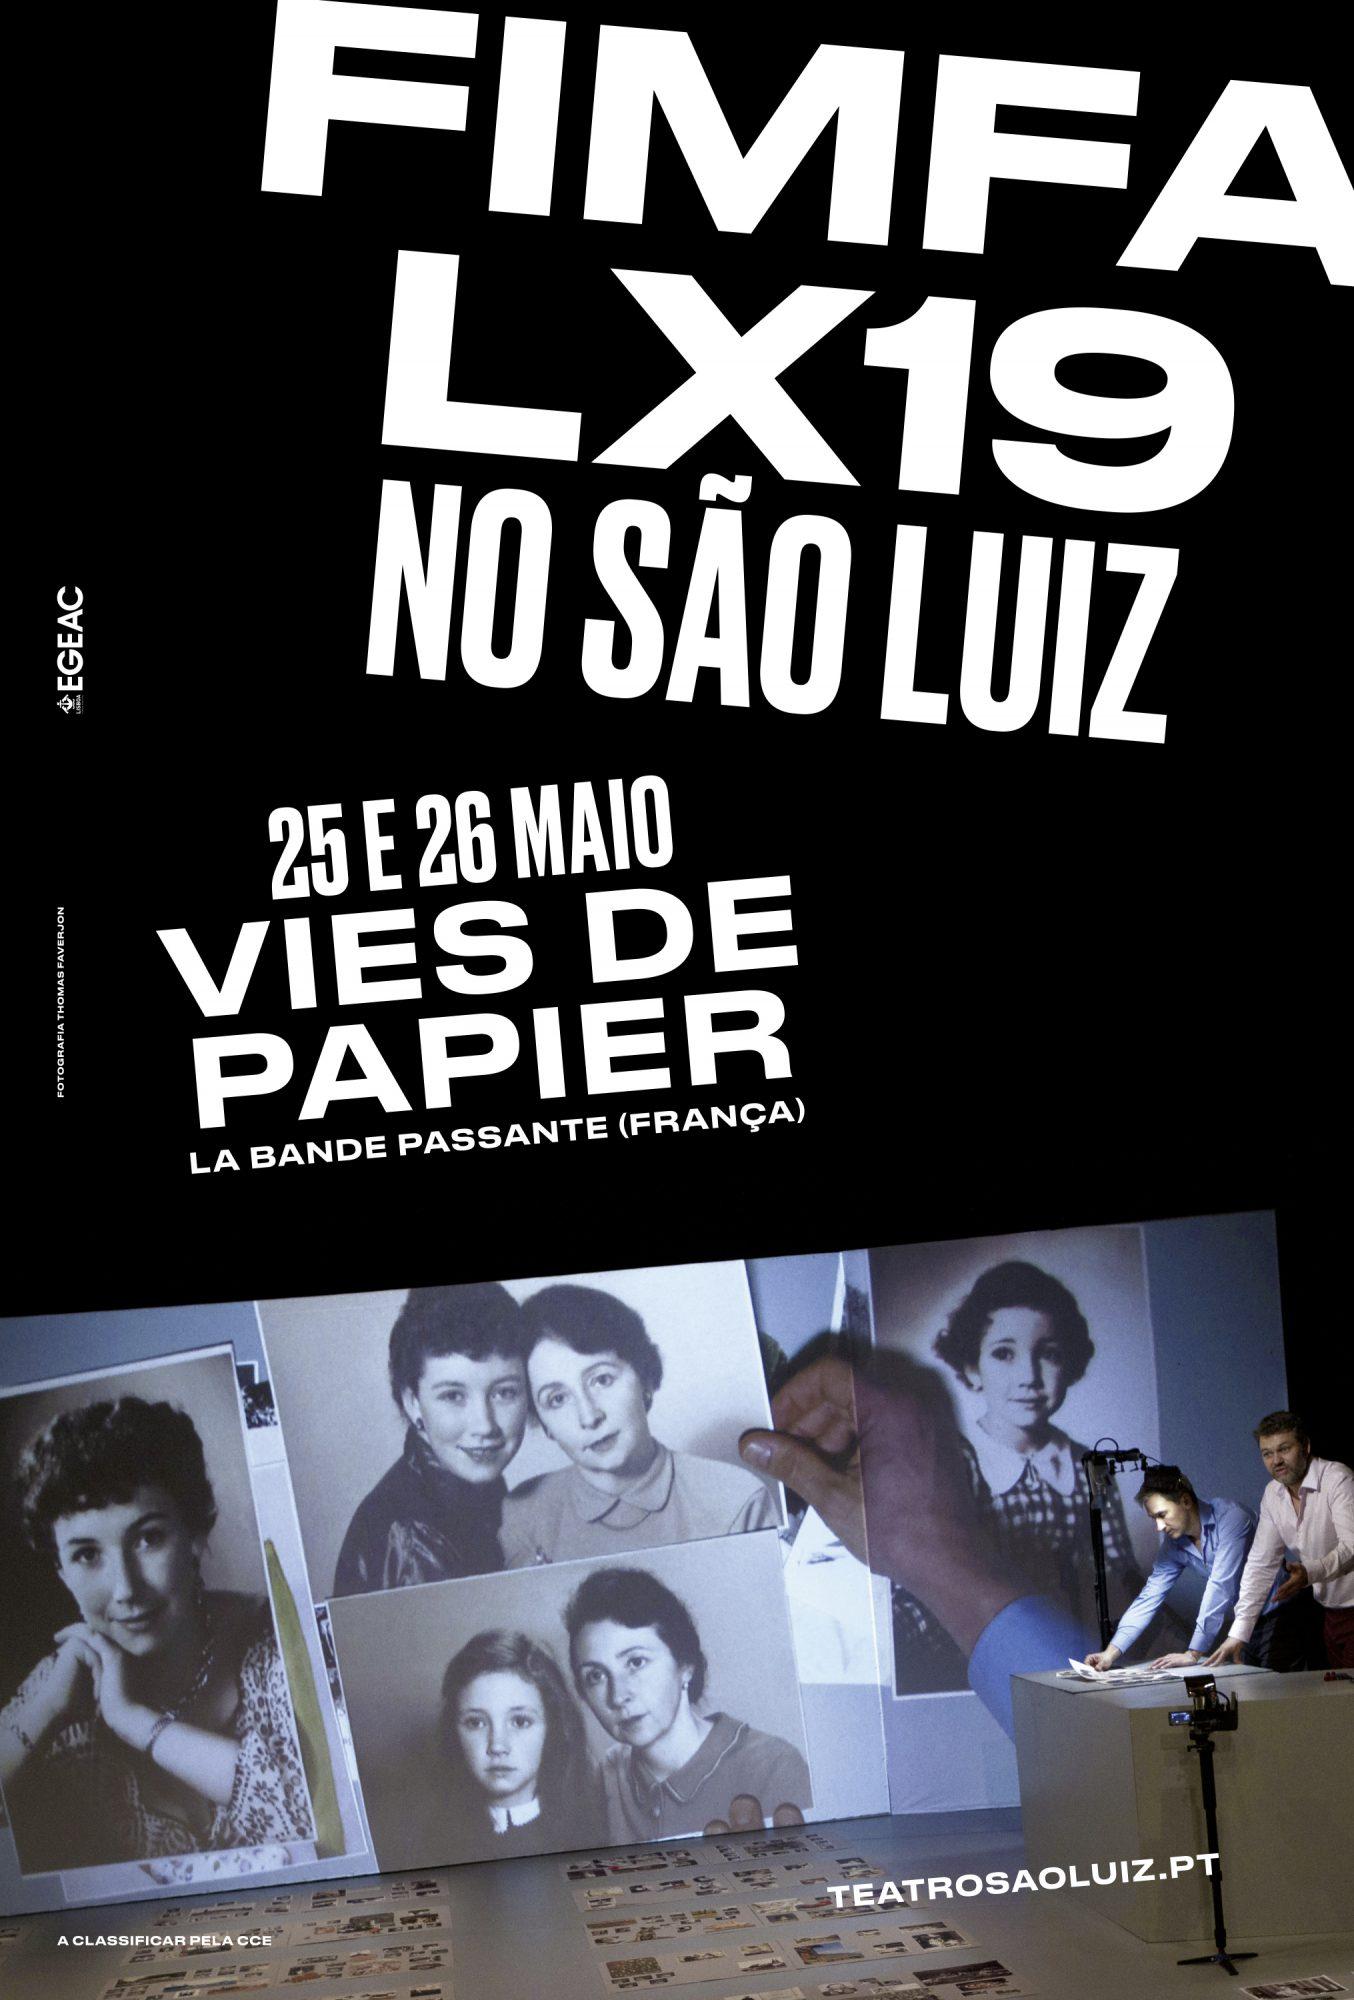 Vies de Papier, FIMFA LX19, maio 2019